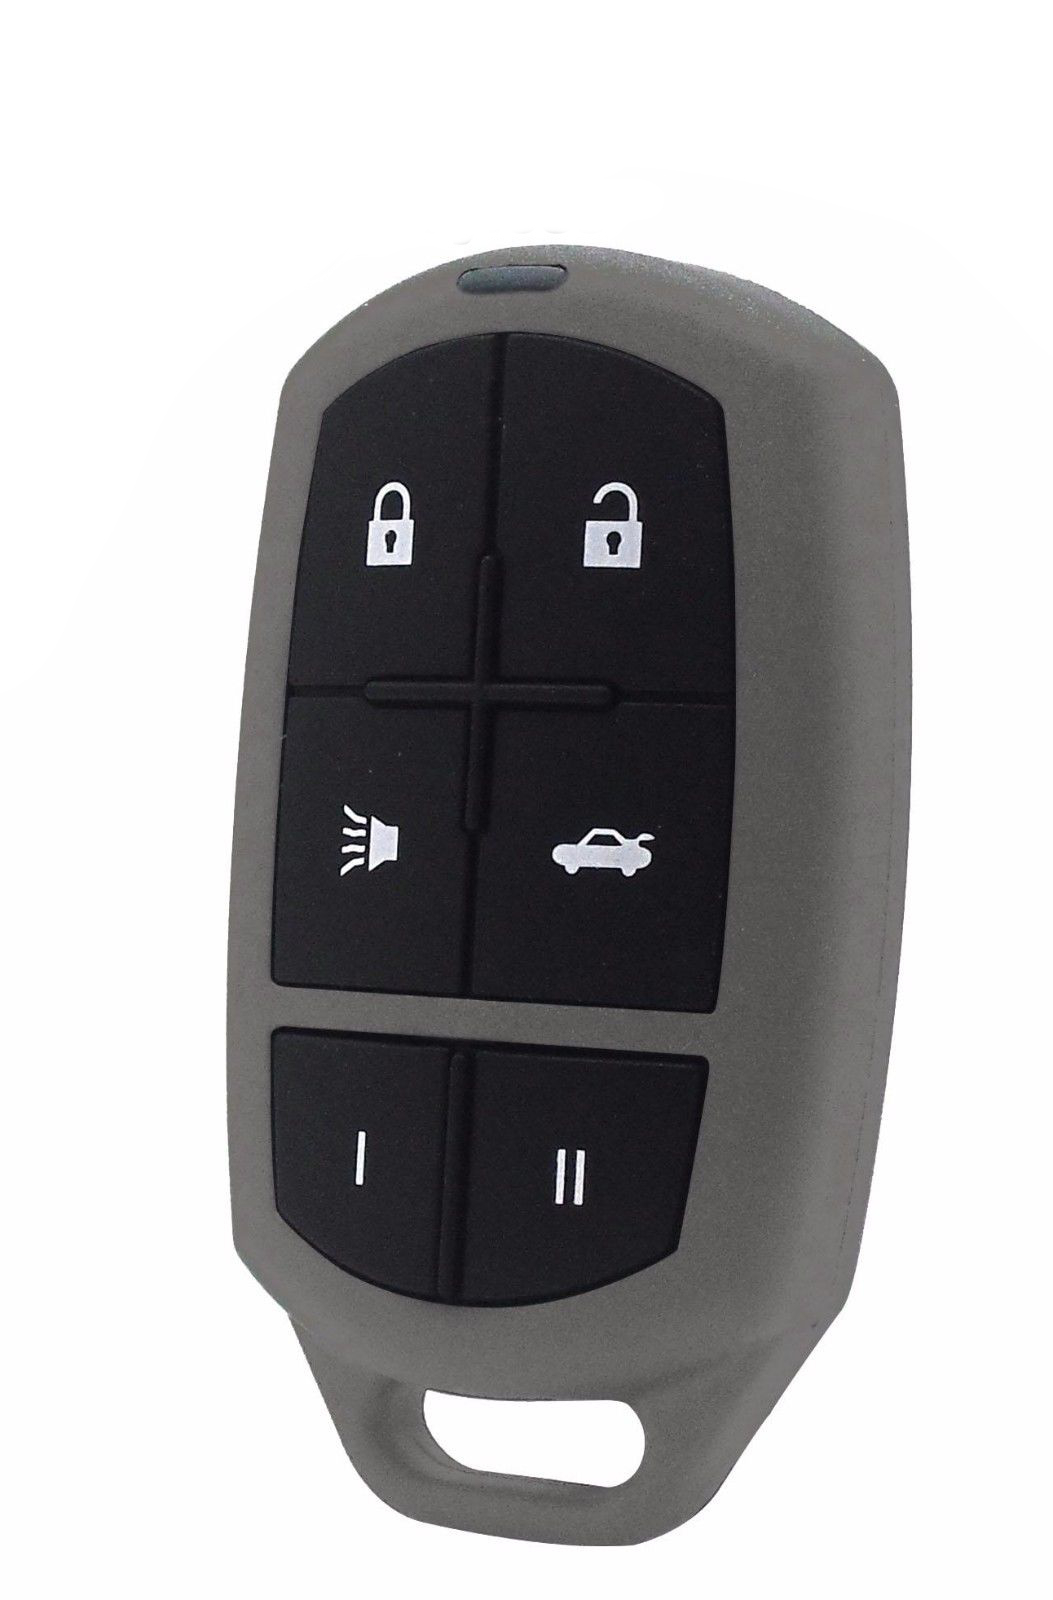 iKeyless Brand Remote Keyless Entry - 3 Button